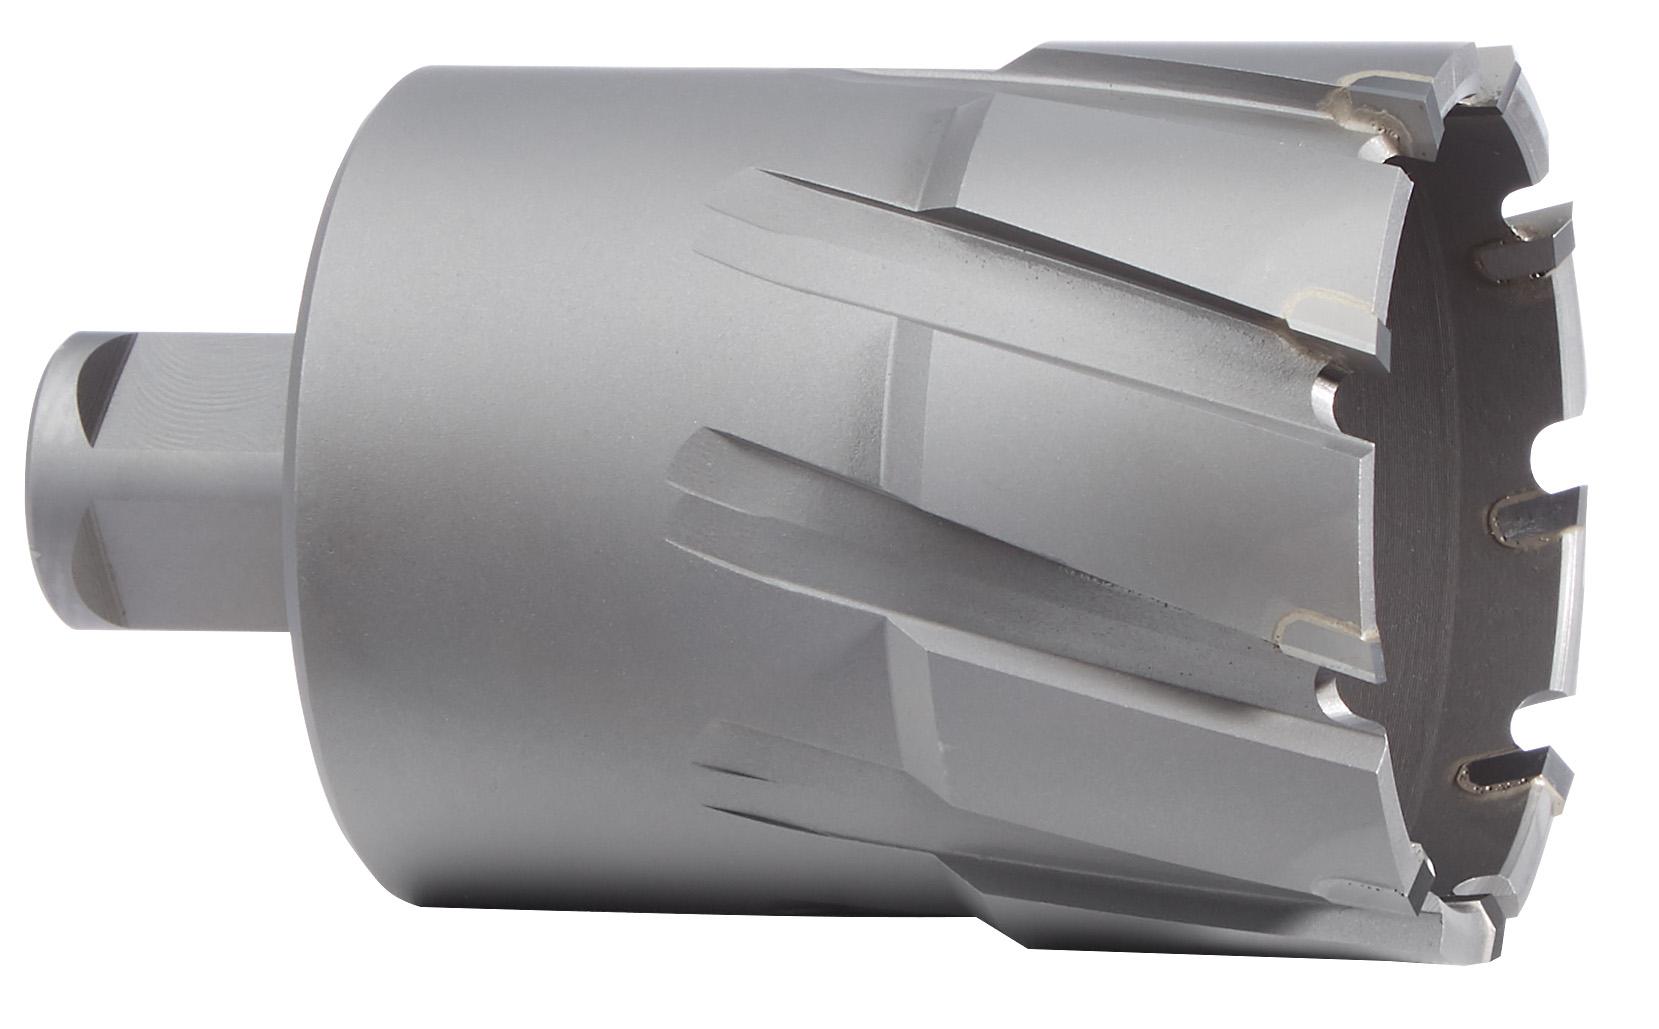 Milwaukee® 49-59-4225 Annular Cutter, 2-1/4 in Dia Cutter, 2 in D Cutting, Weld-On Shank